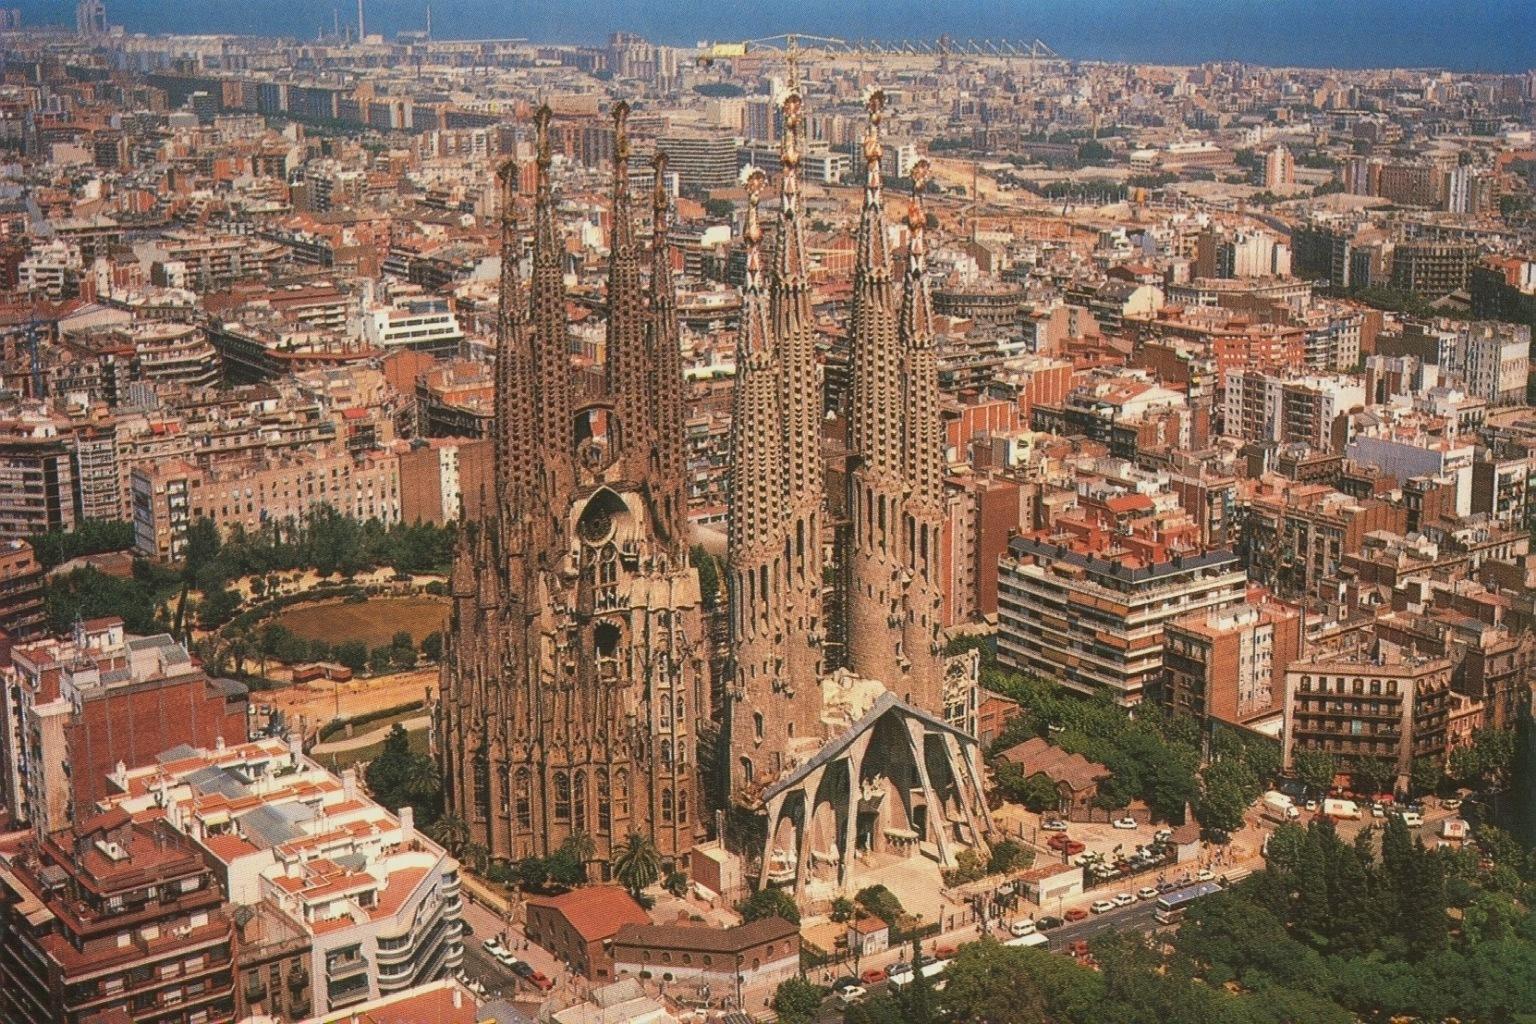 Peque o garaje de 30 plazas junto sagrada familia en barcelona for De la sagrada familia